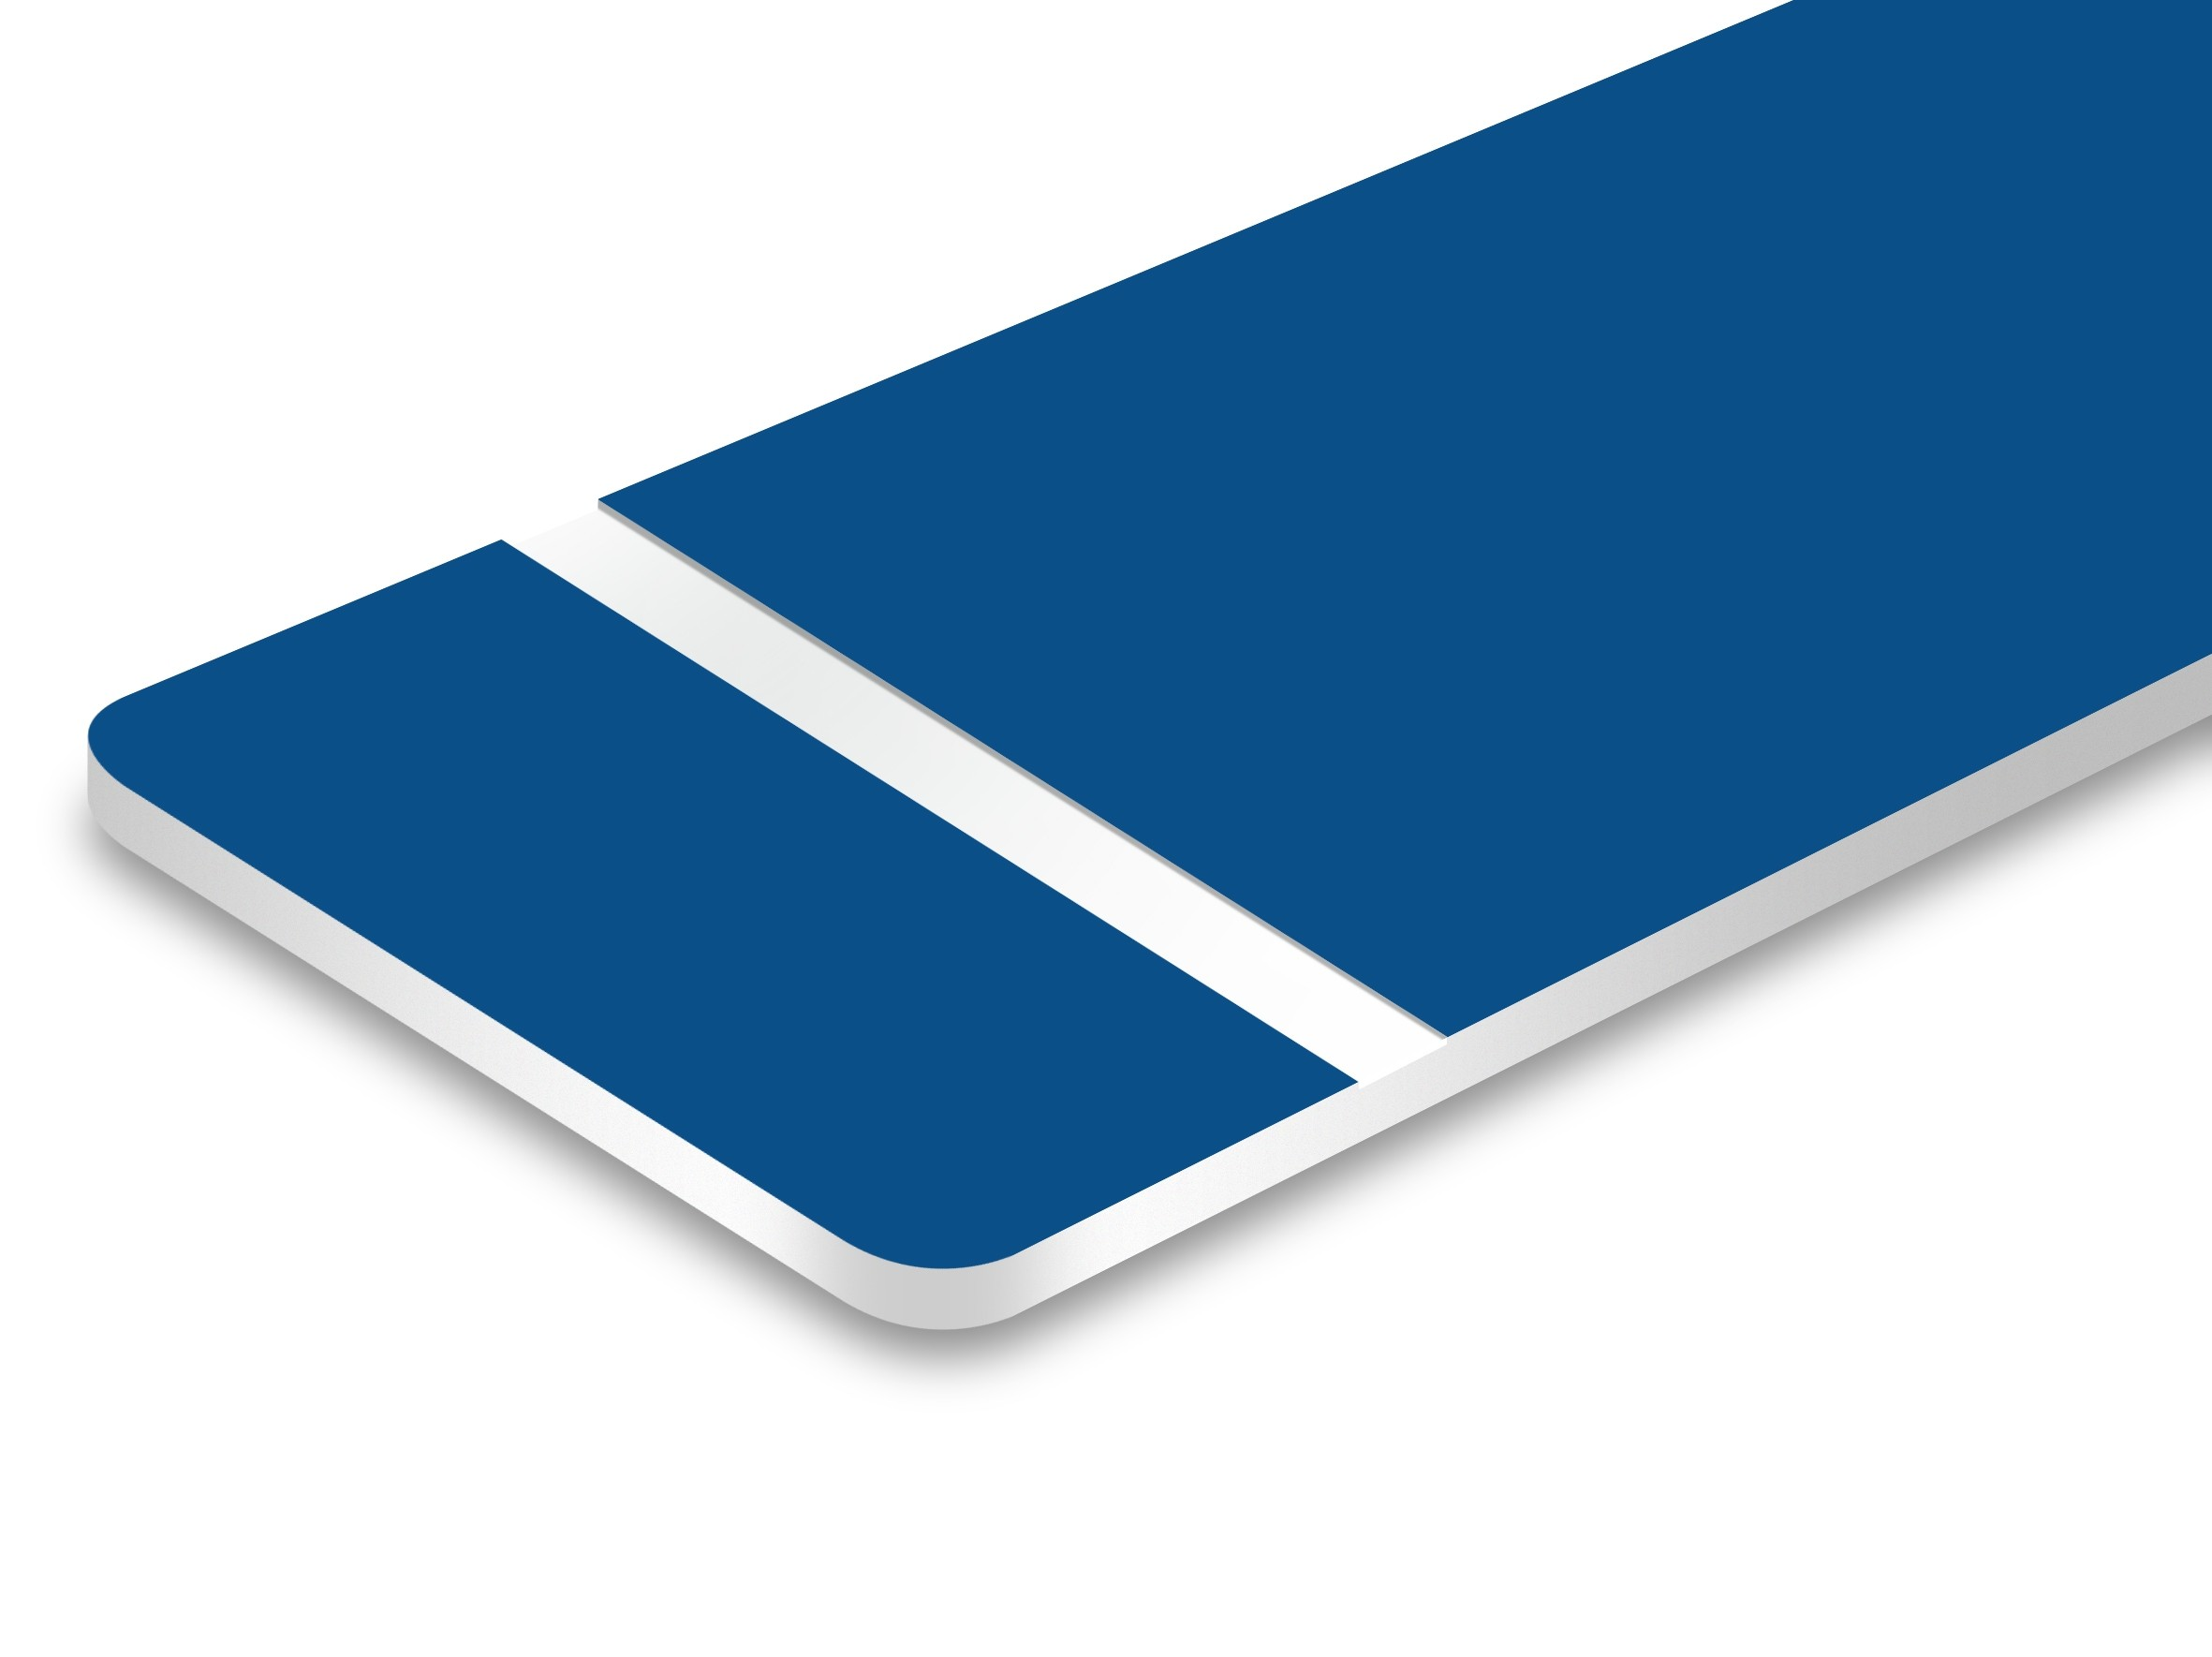 TroLase Ultra matt blue/white 1.5 mm